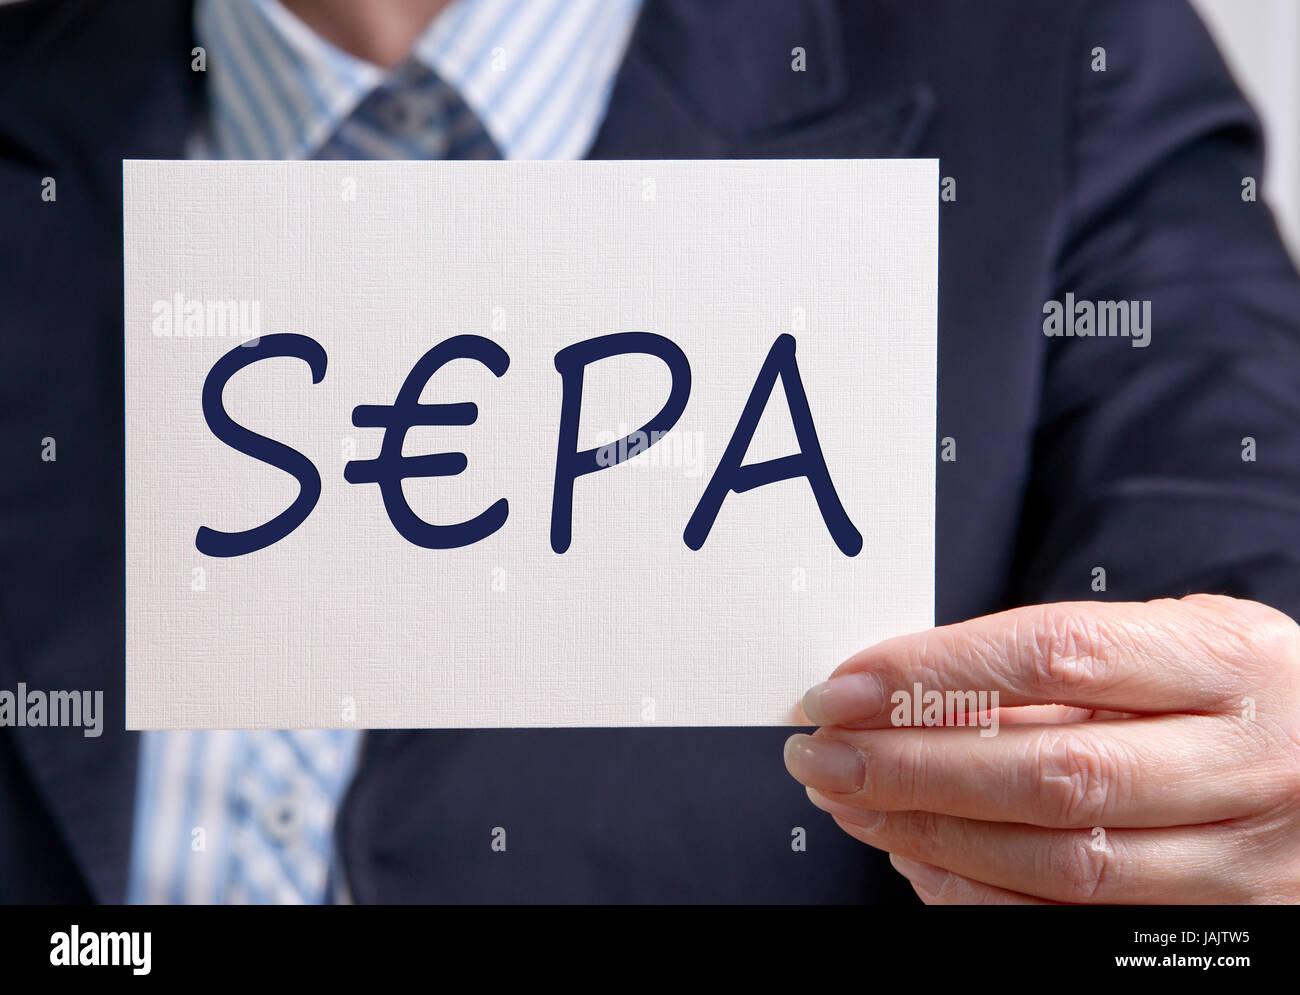 SEPA - Online Banking - Stock Image